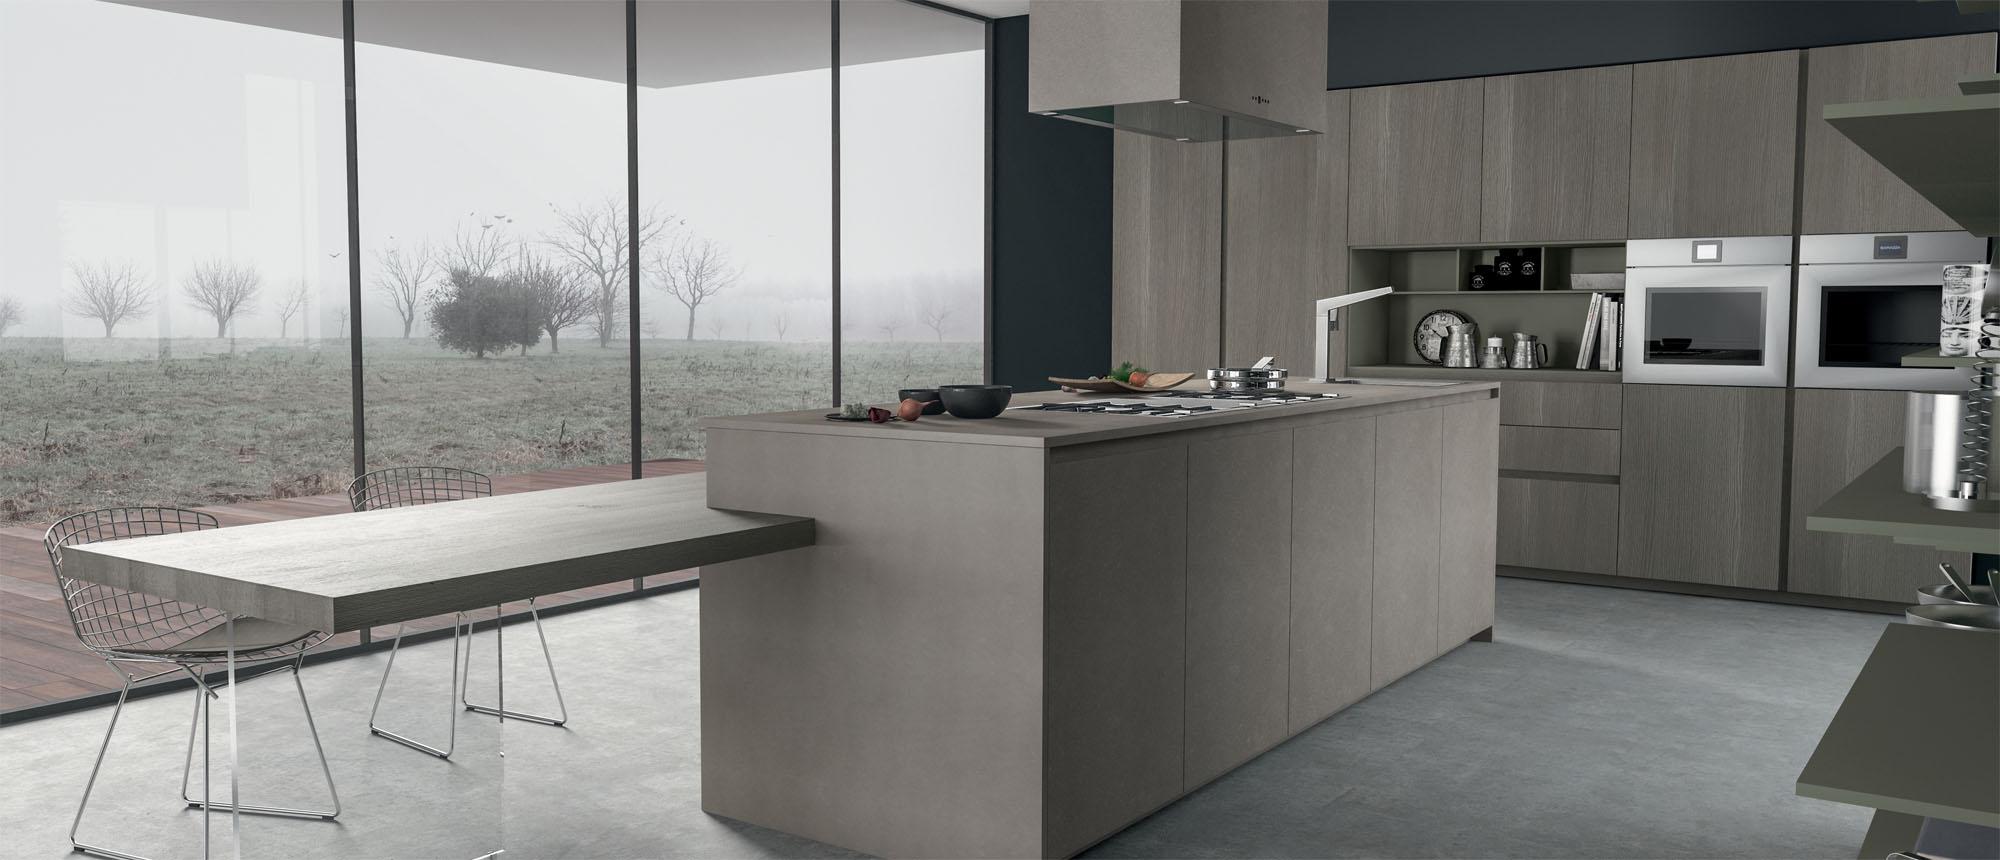 G30 kerlite spedo mobili - Kerlite rivestimento cucina ...